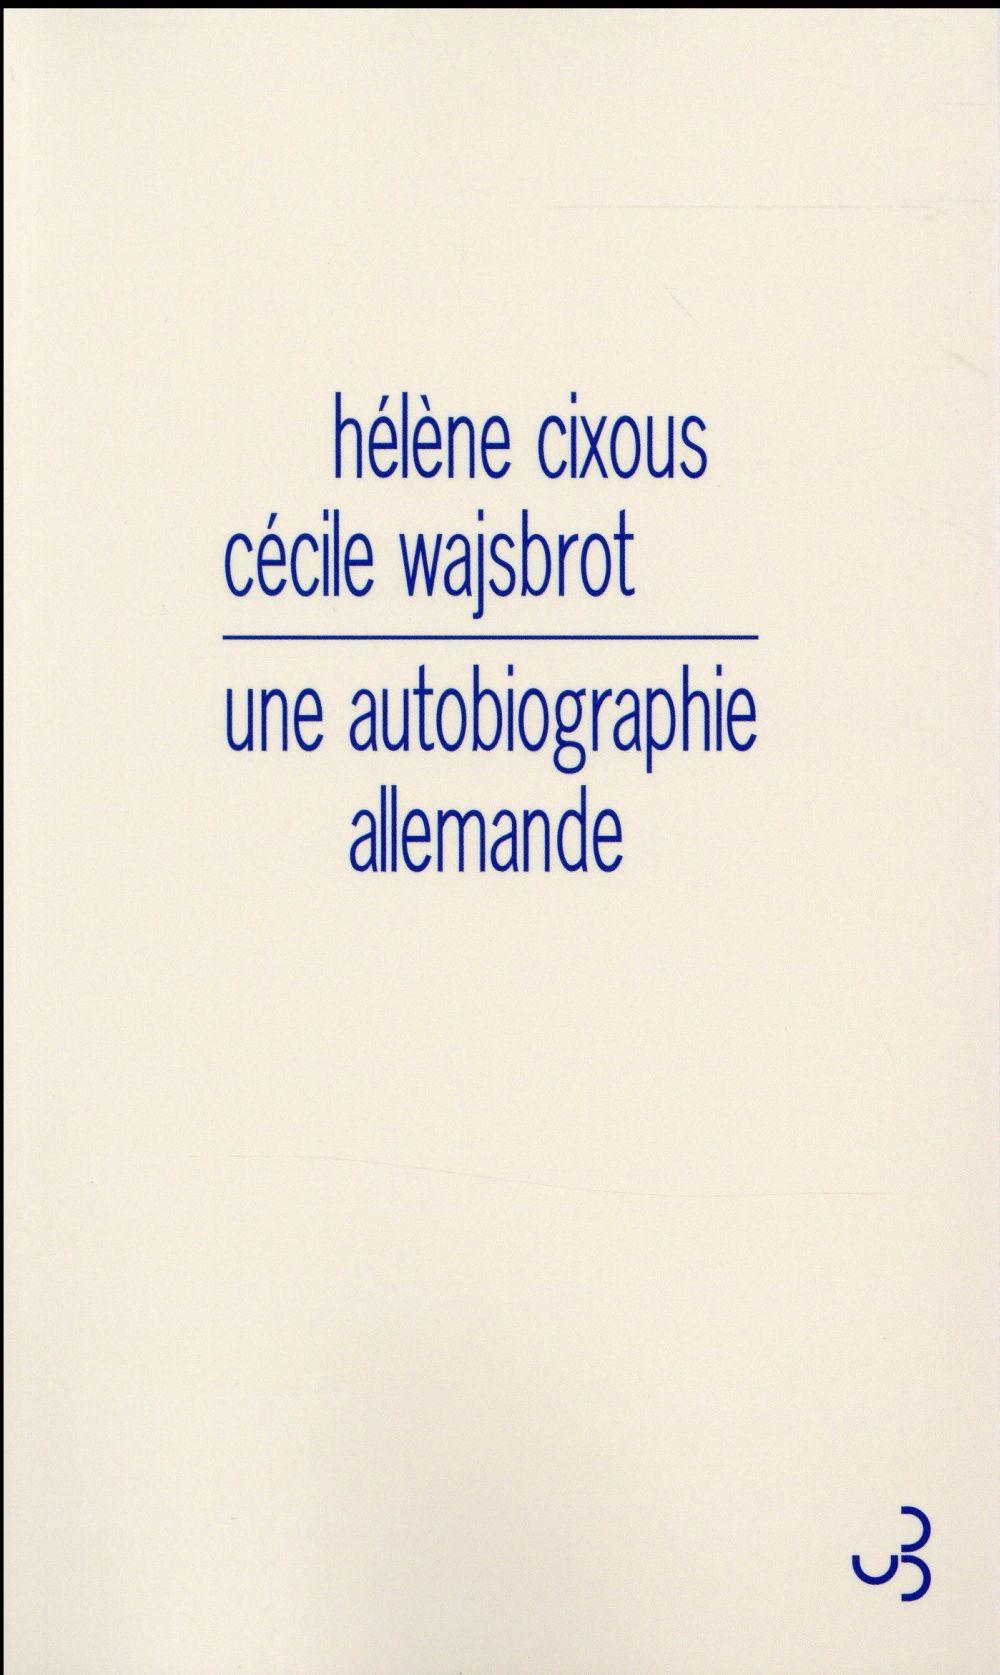 Une autobiographie allemande